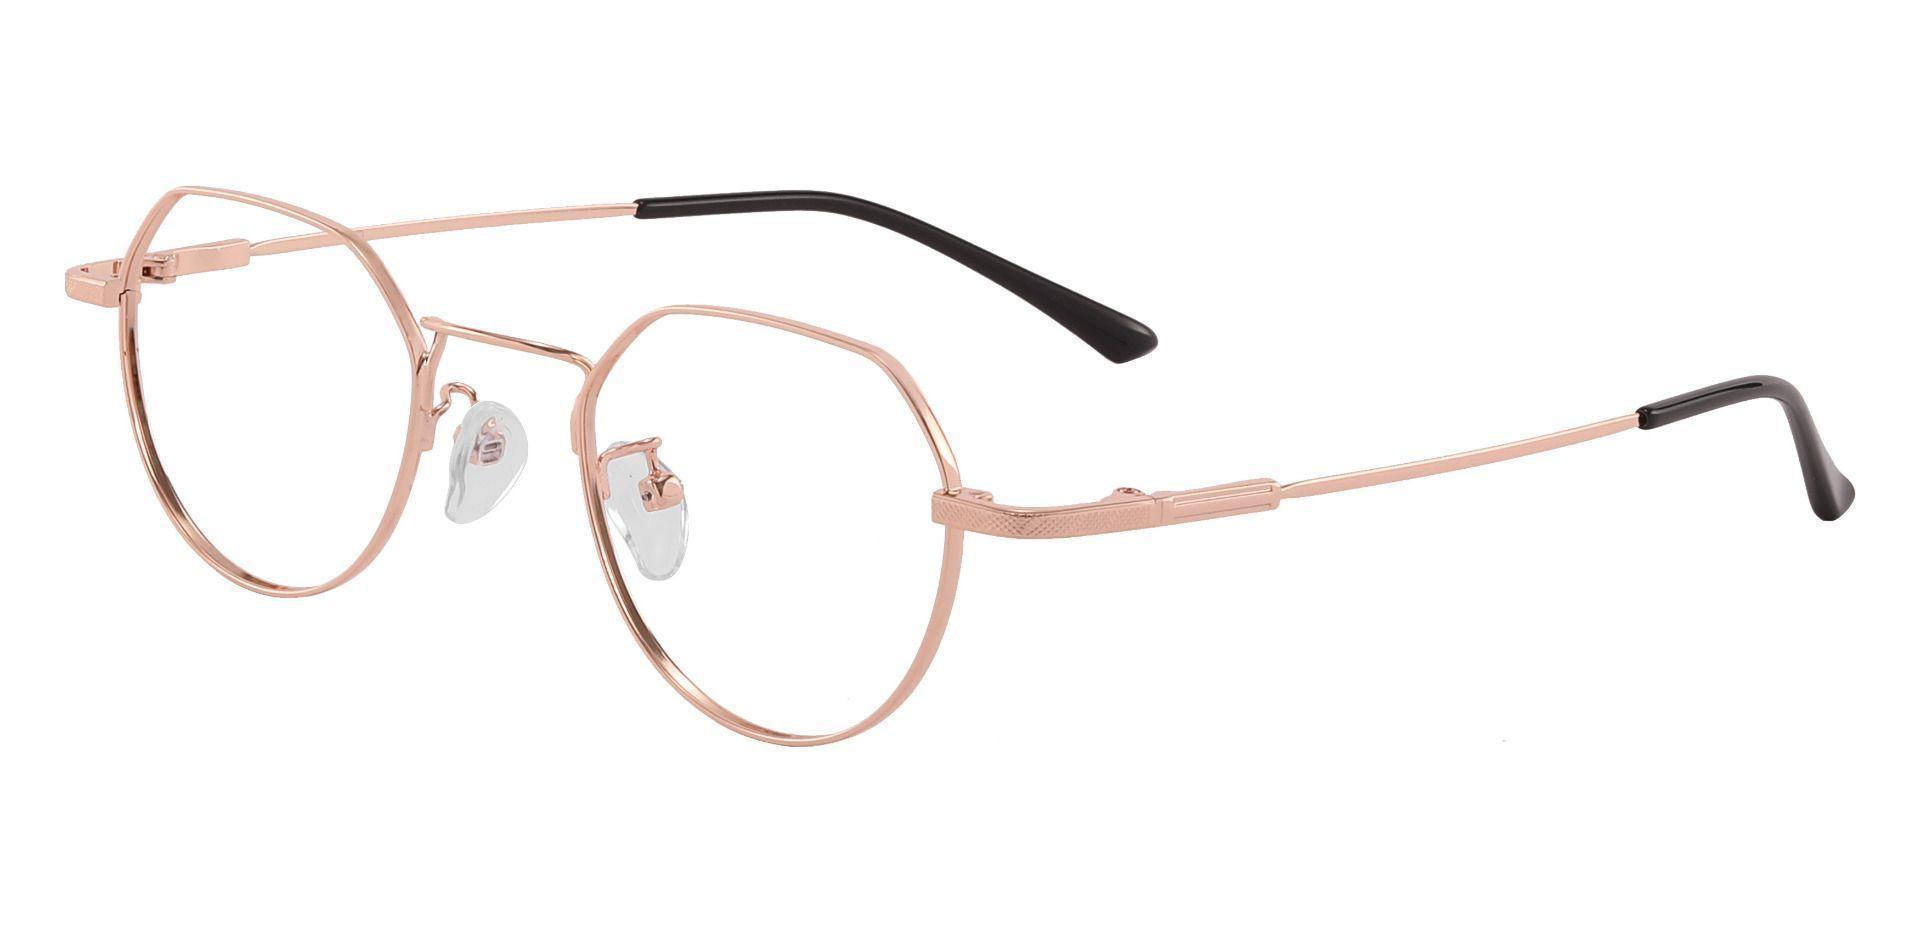 Douglas Geometric Prescription Glasses - Rose Gold